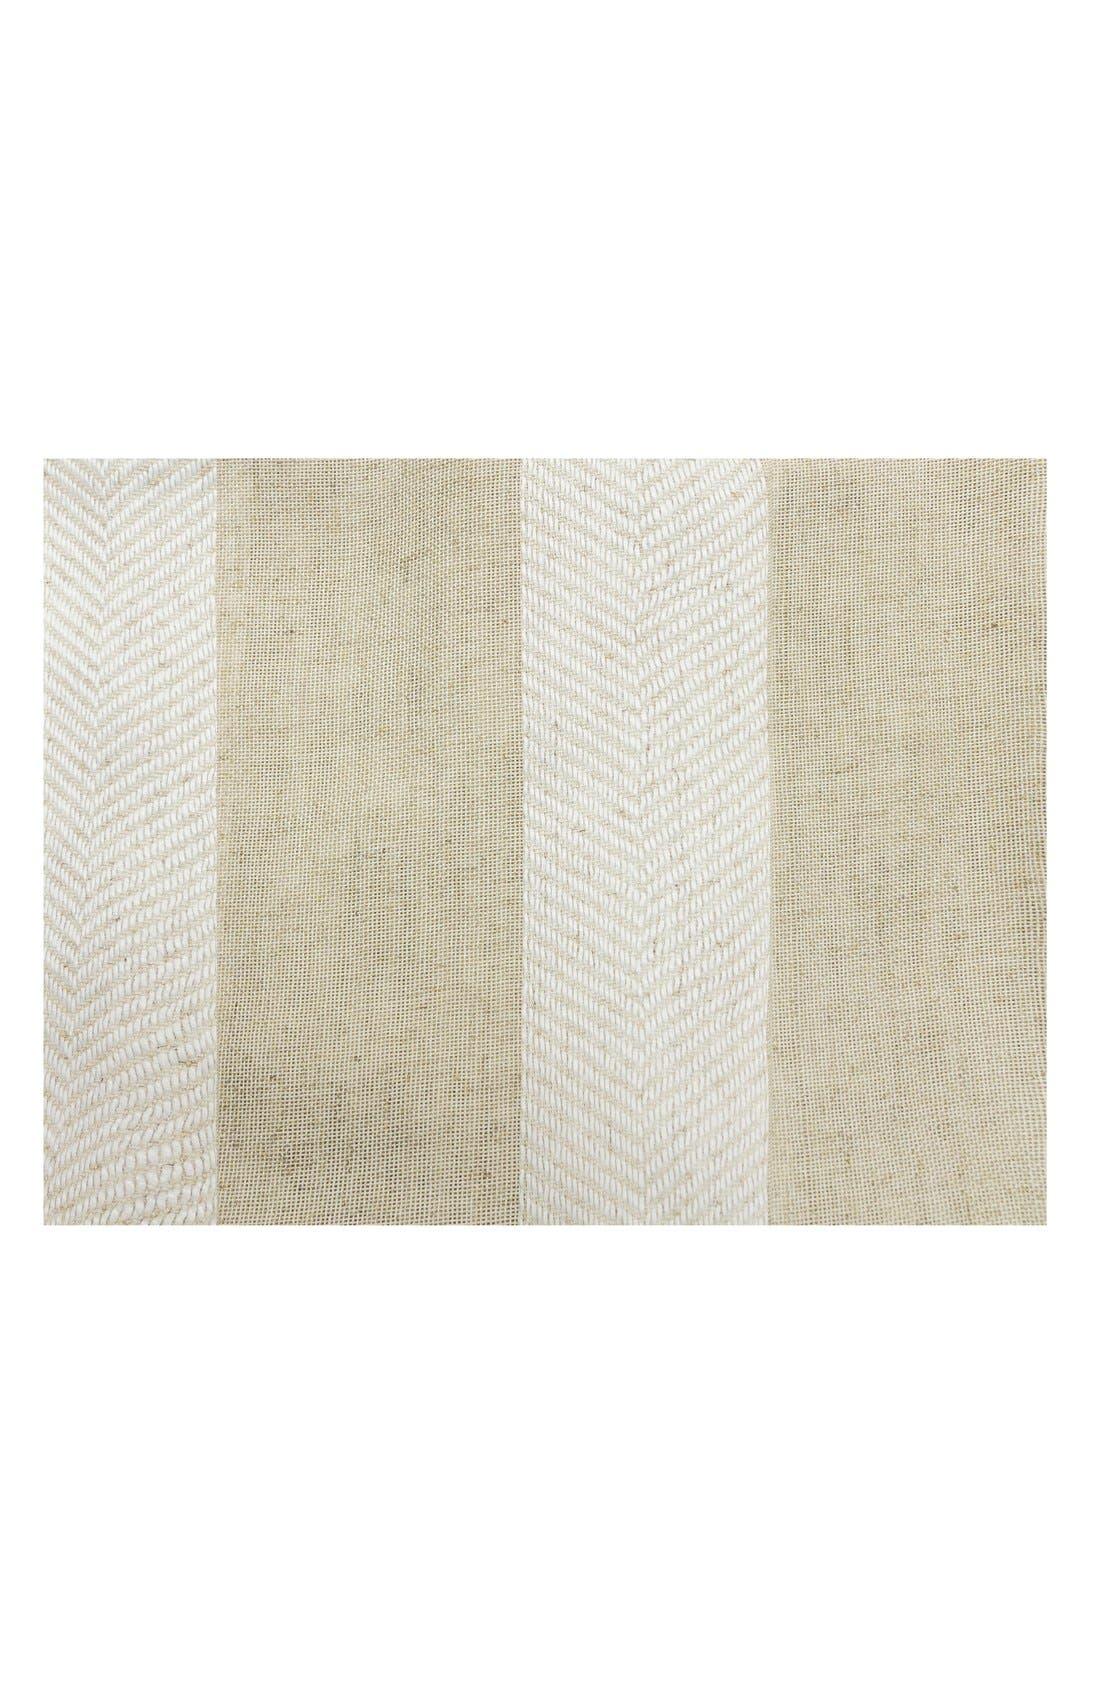 Alternate Image 3  - Duck River Textile 'Newbury' Window Panels (Set of 2)